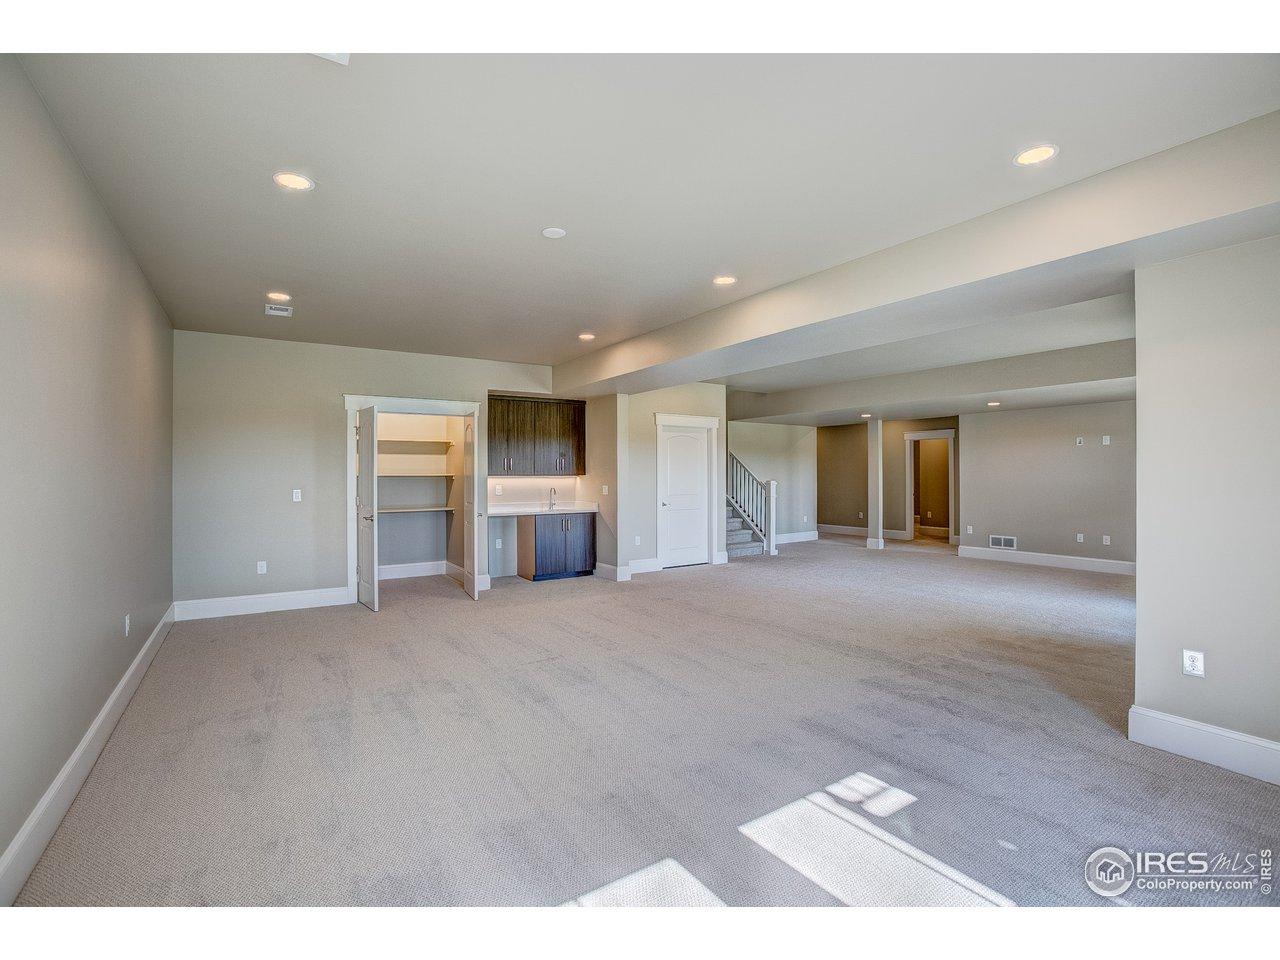 Birght, walk-out basement